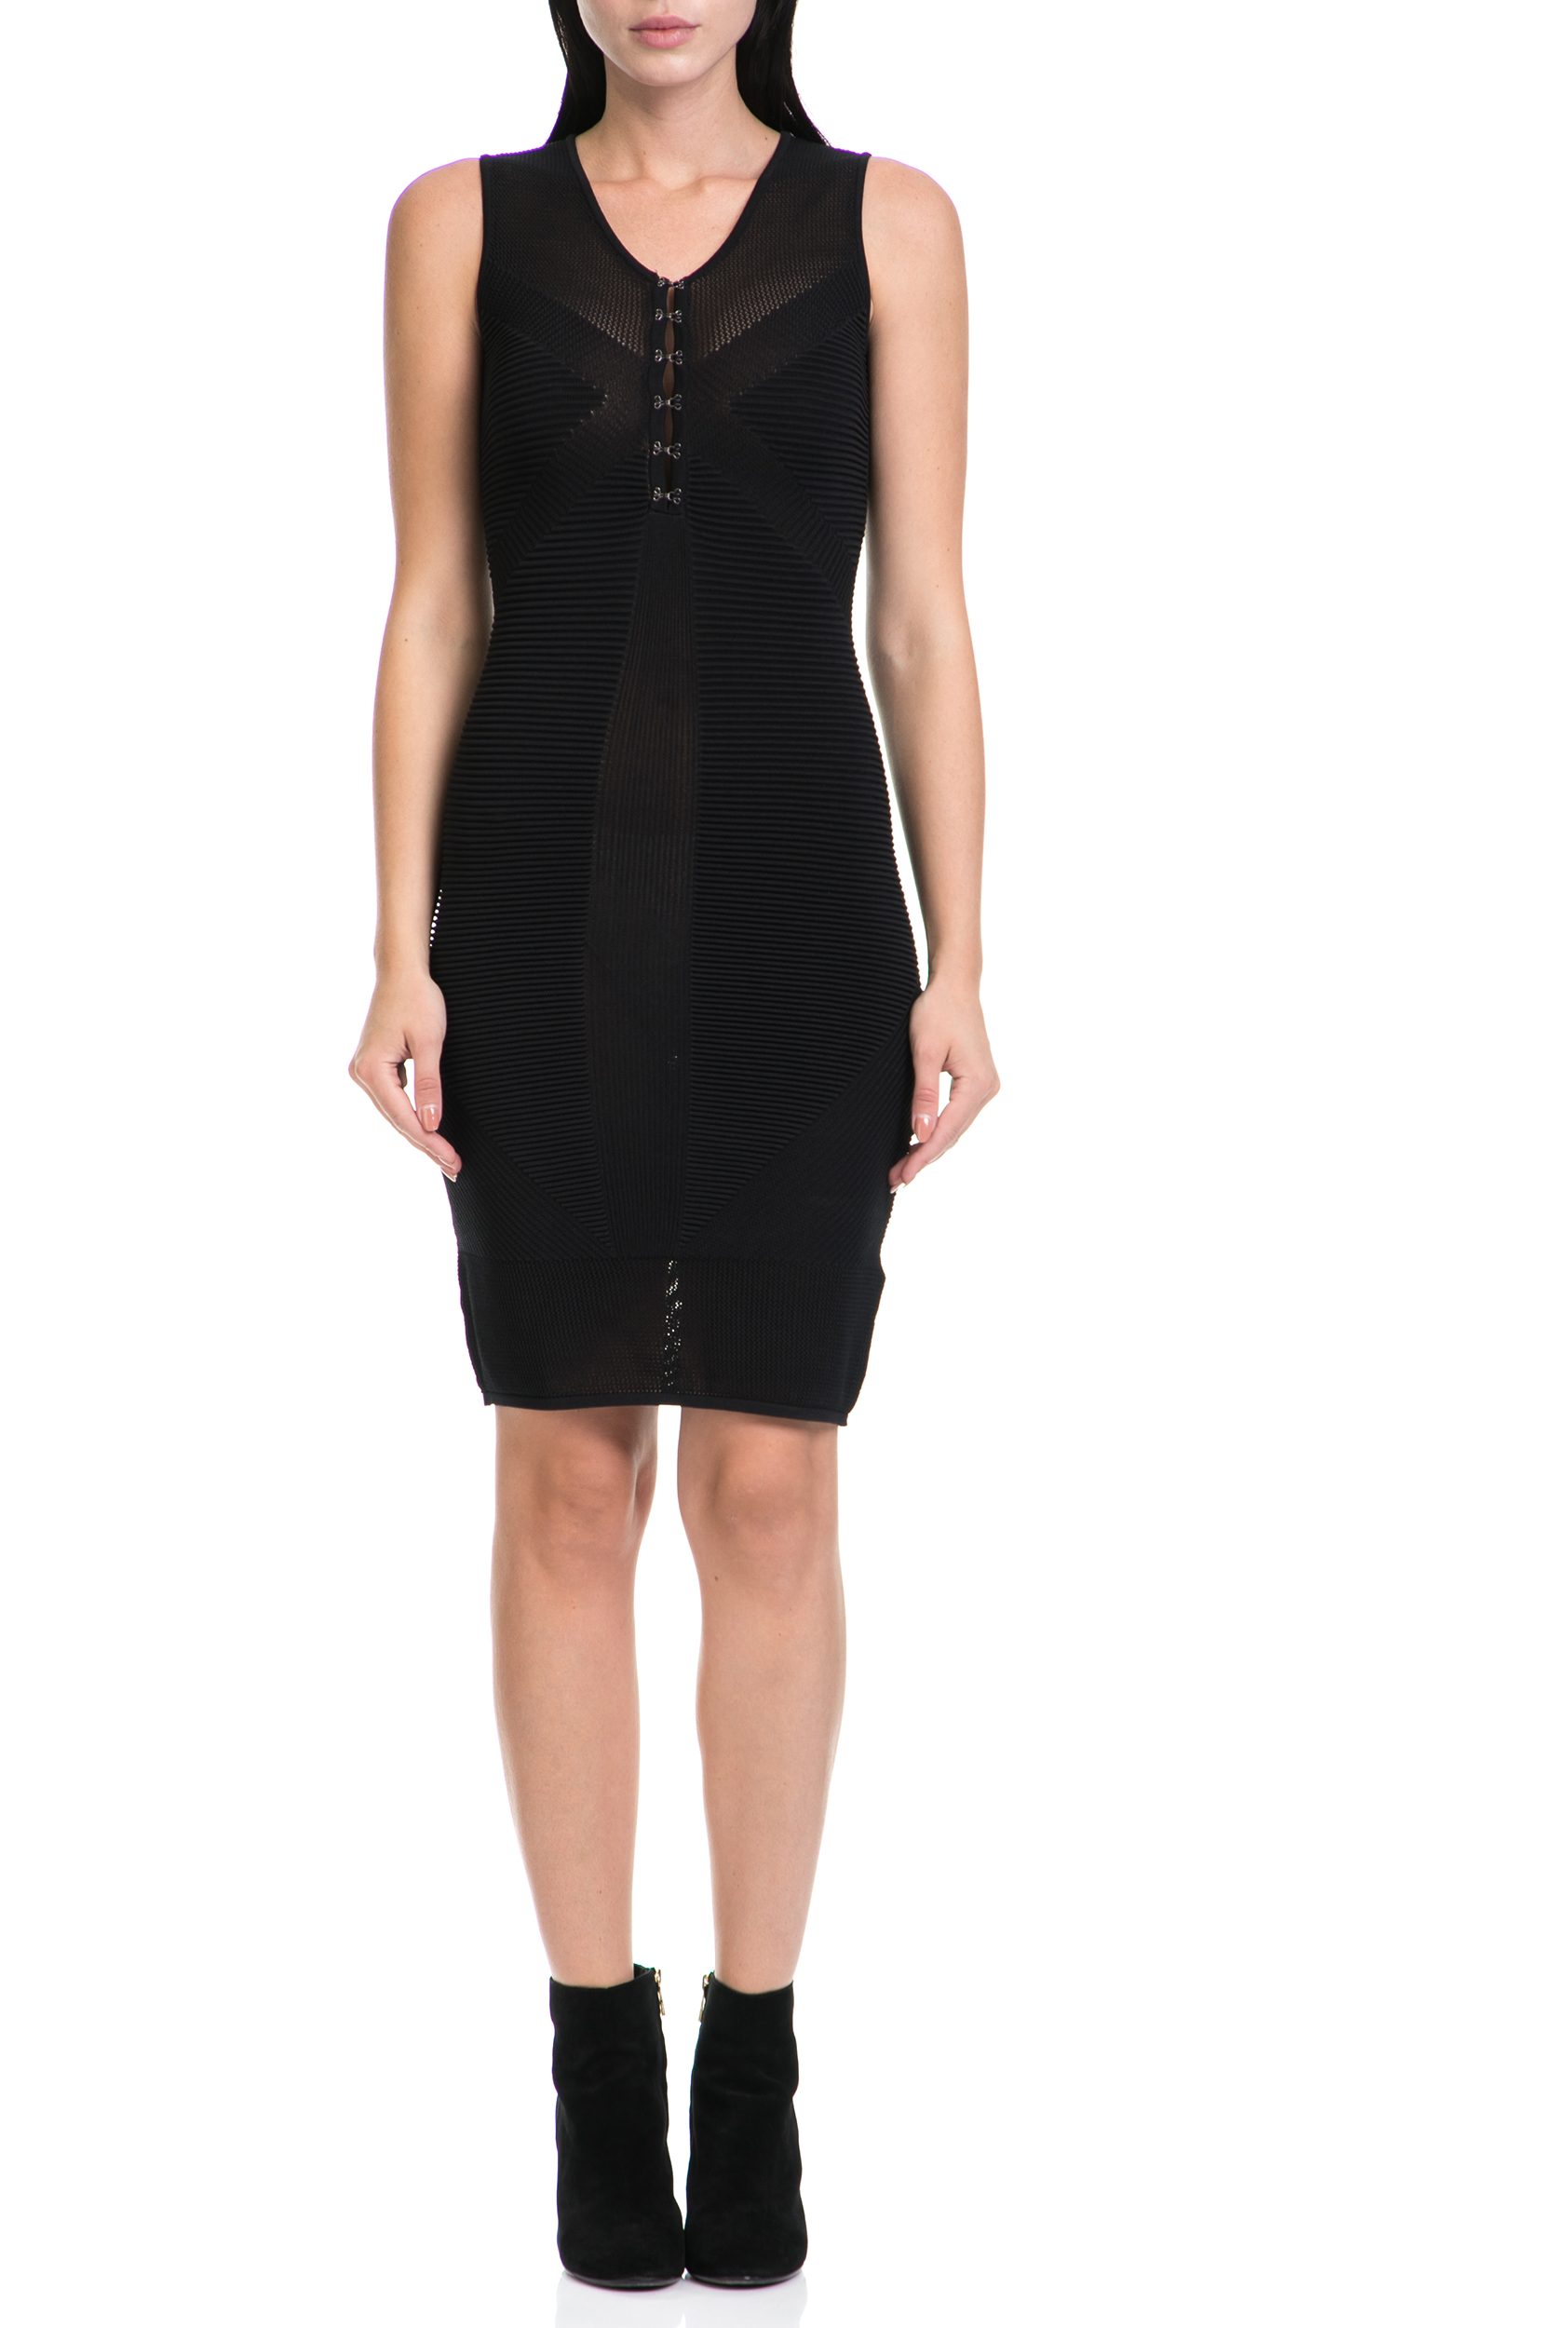 GUESS - Γυναικείο φόρεμα ANGELINA GUESS μαύρο γυναικεία ρούχα φορέματα μέχρι το γόνατο